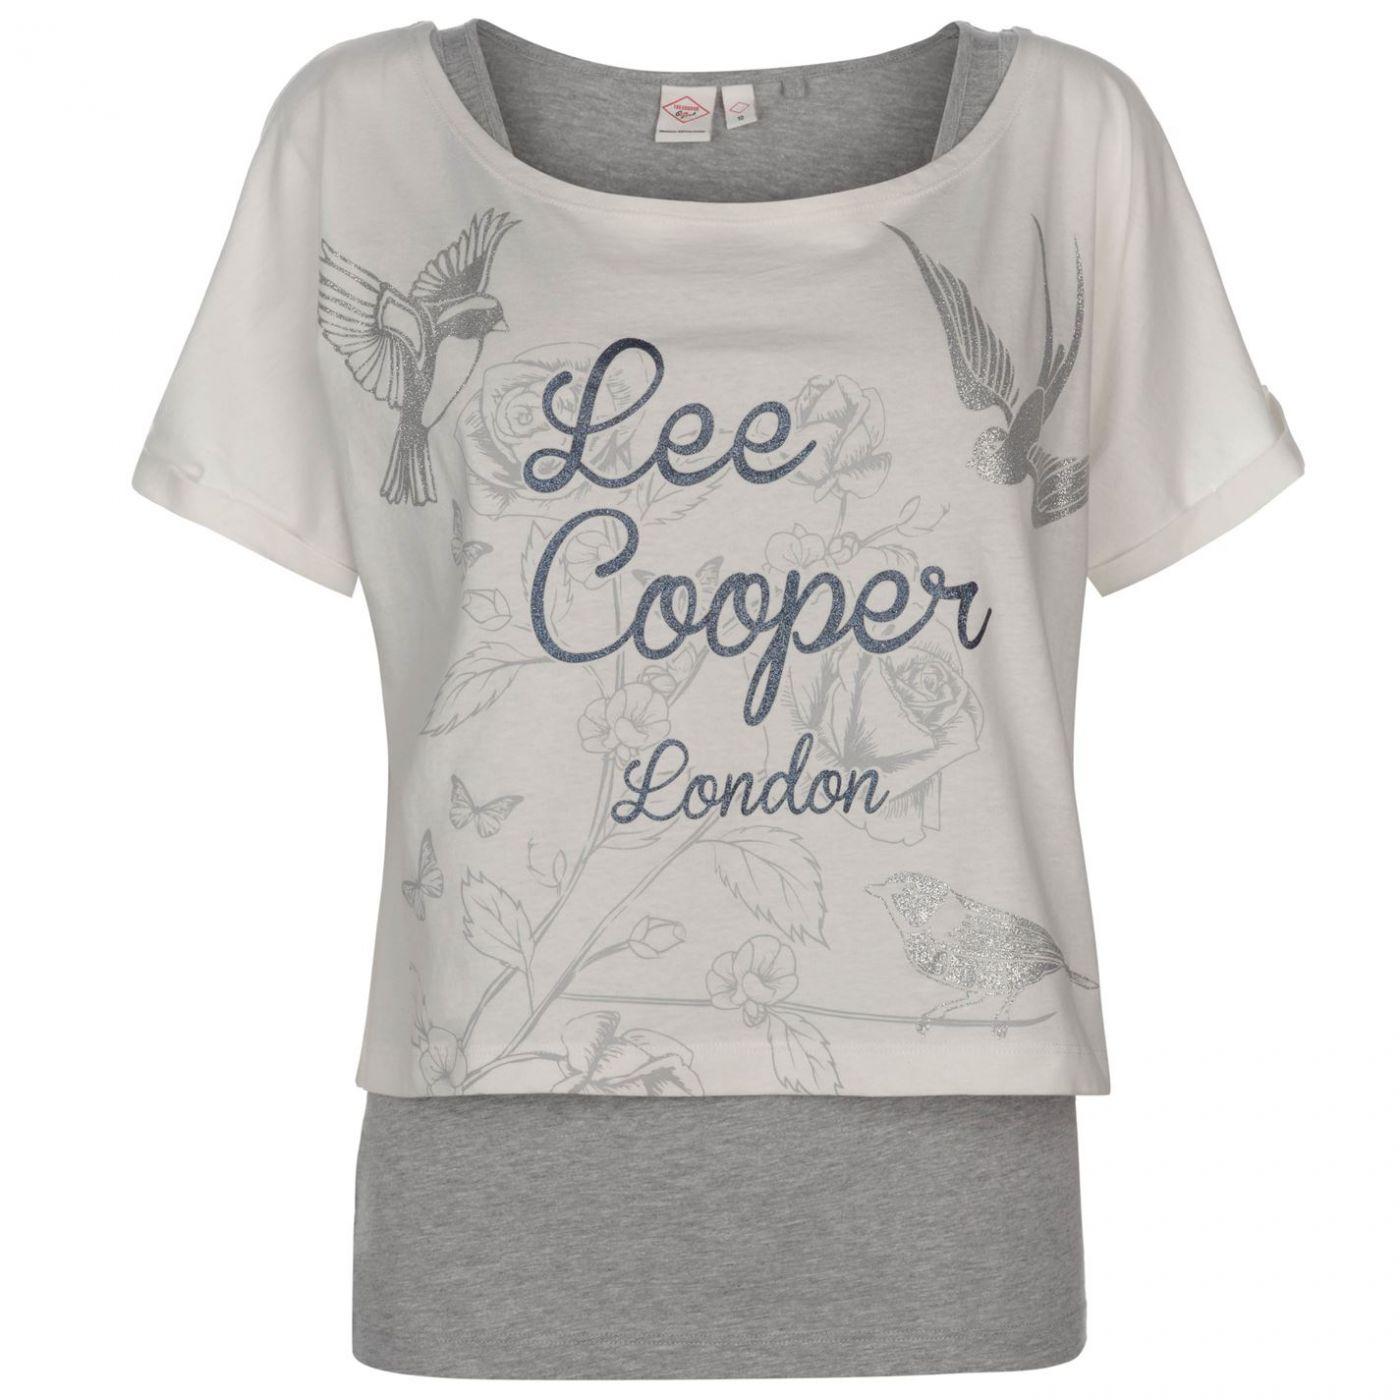 Lee Cooper Double Layer T Shirt Set Ladies